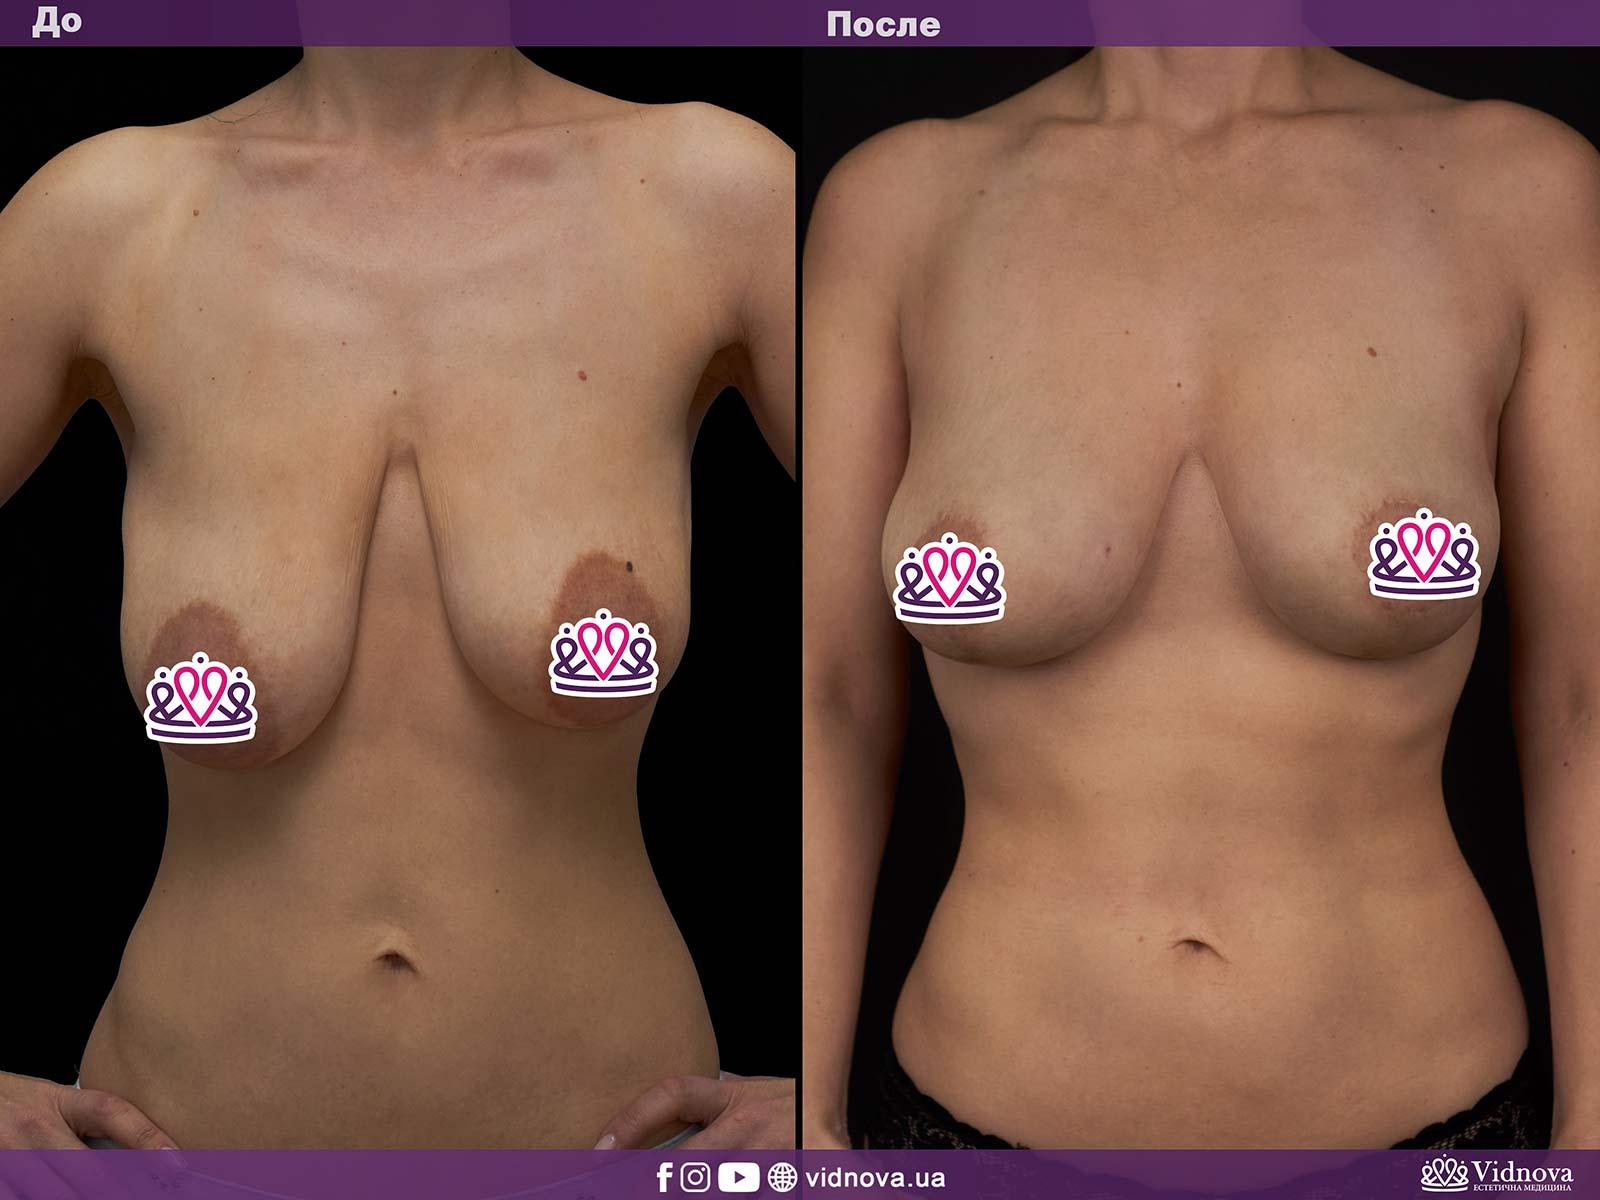 Подтяжка груди: Фото ДО и ПОСЛЕ - Пример №8-1 - Клиника Vidnova